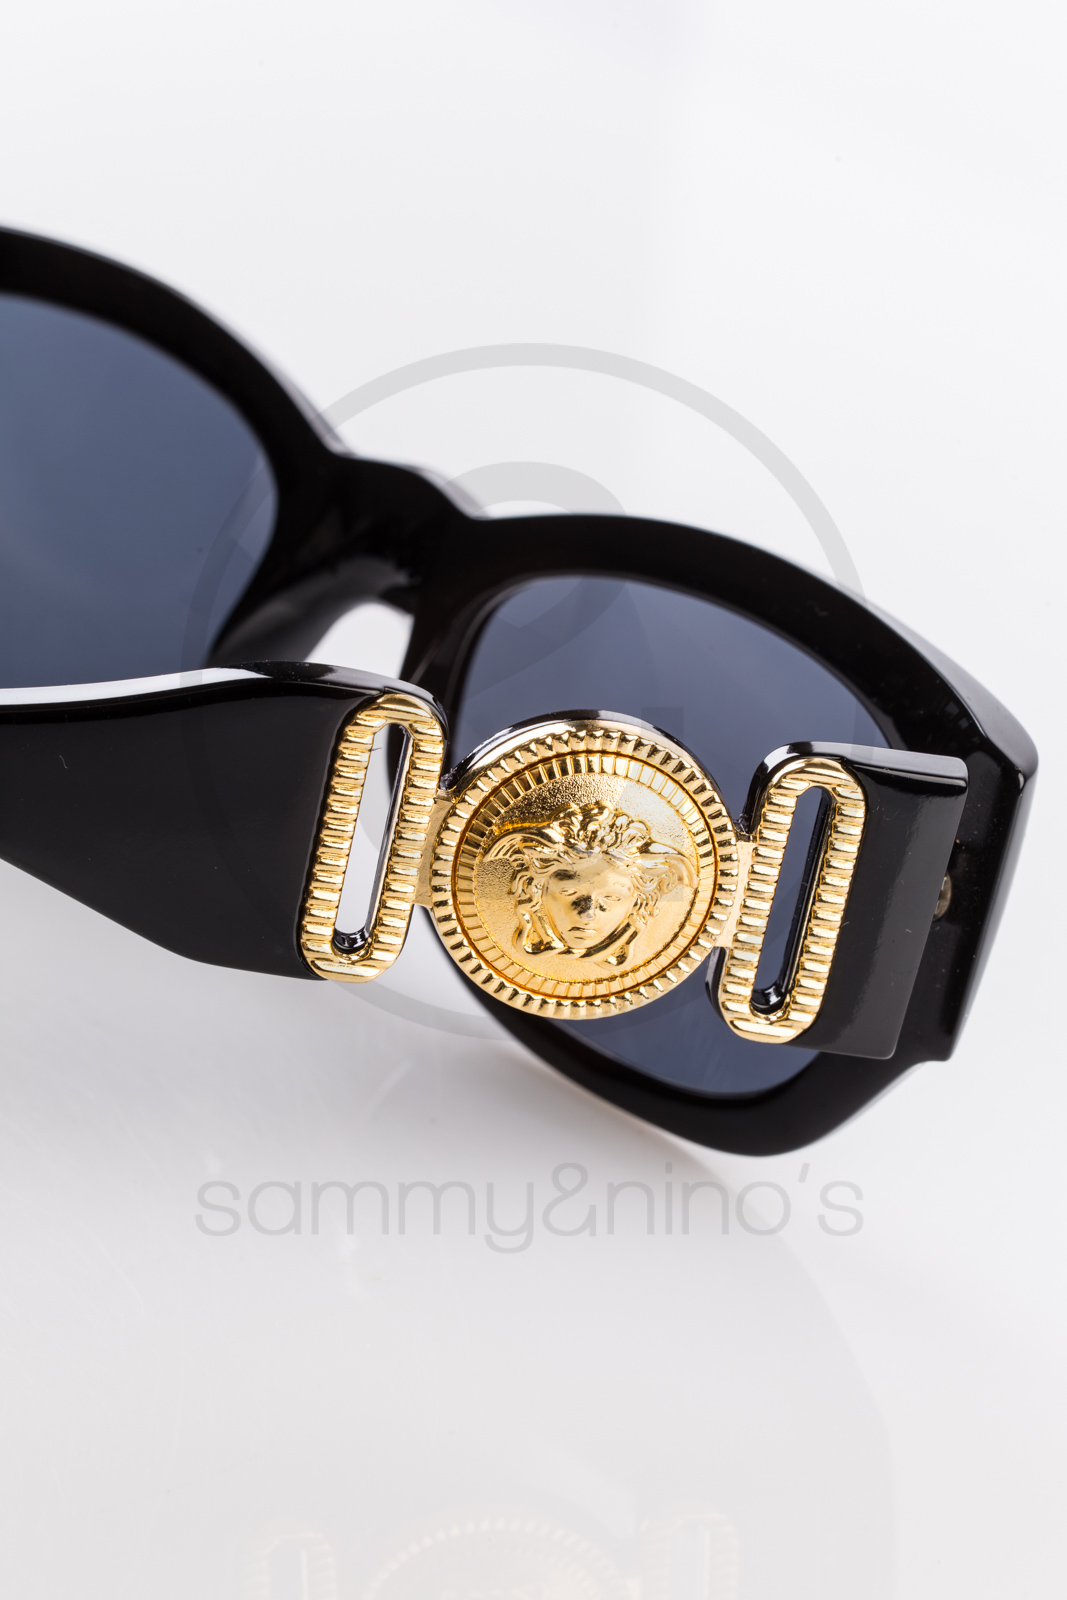 Gianni Versace 413 A 852 Sammy Amp Nino S Store